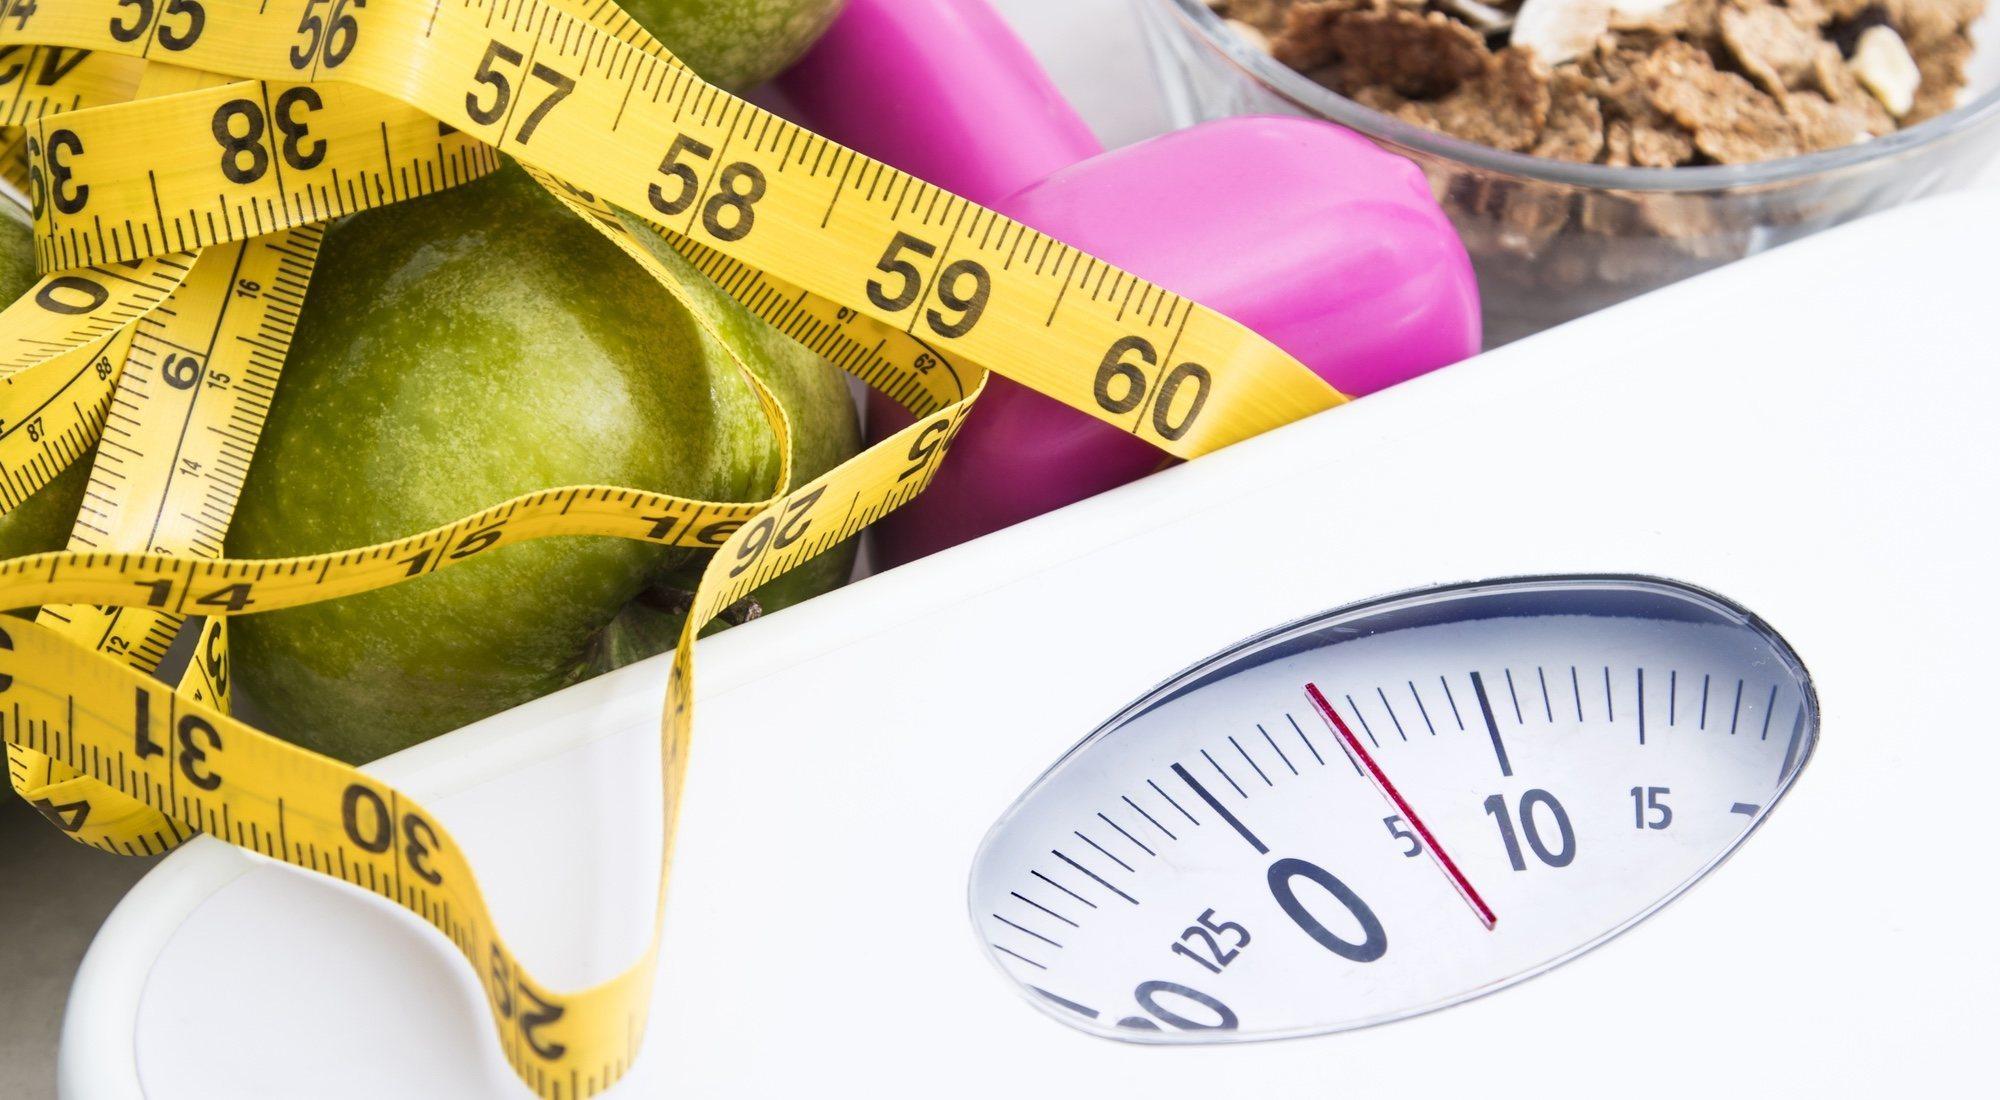 Errores mas comunes al hacer dieta